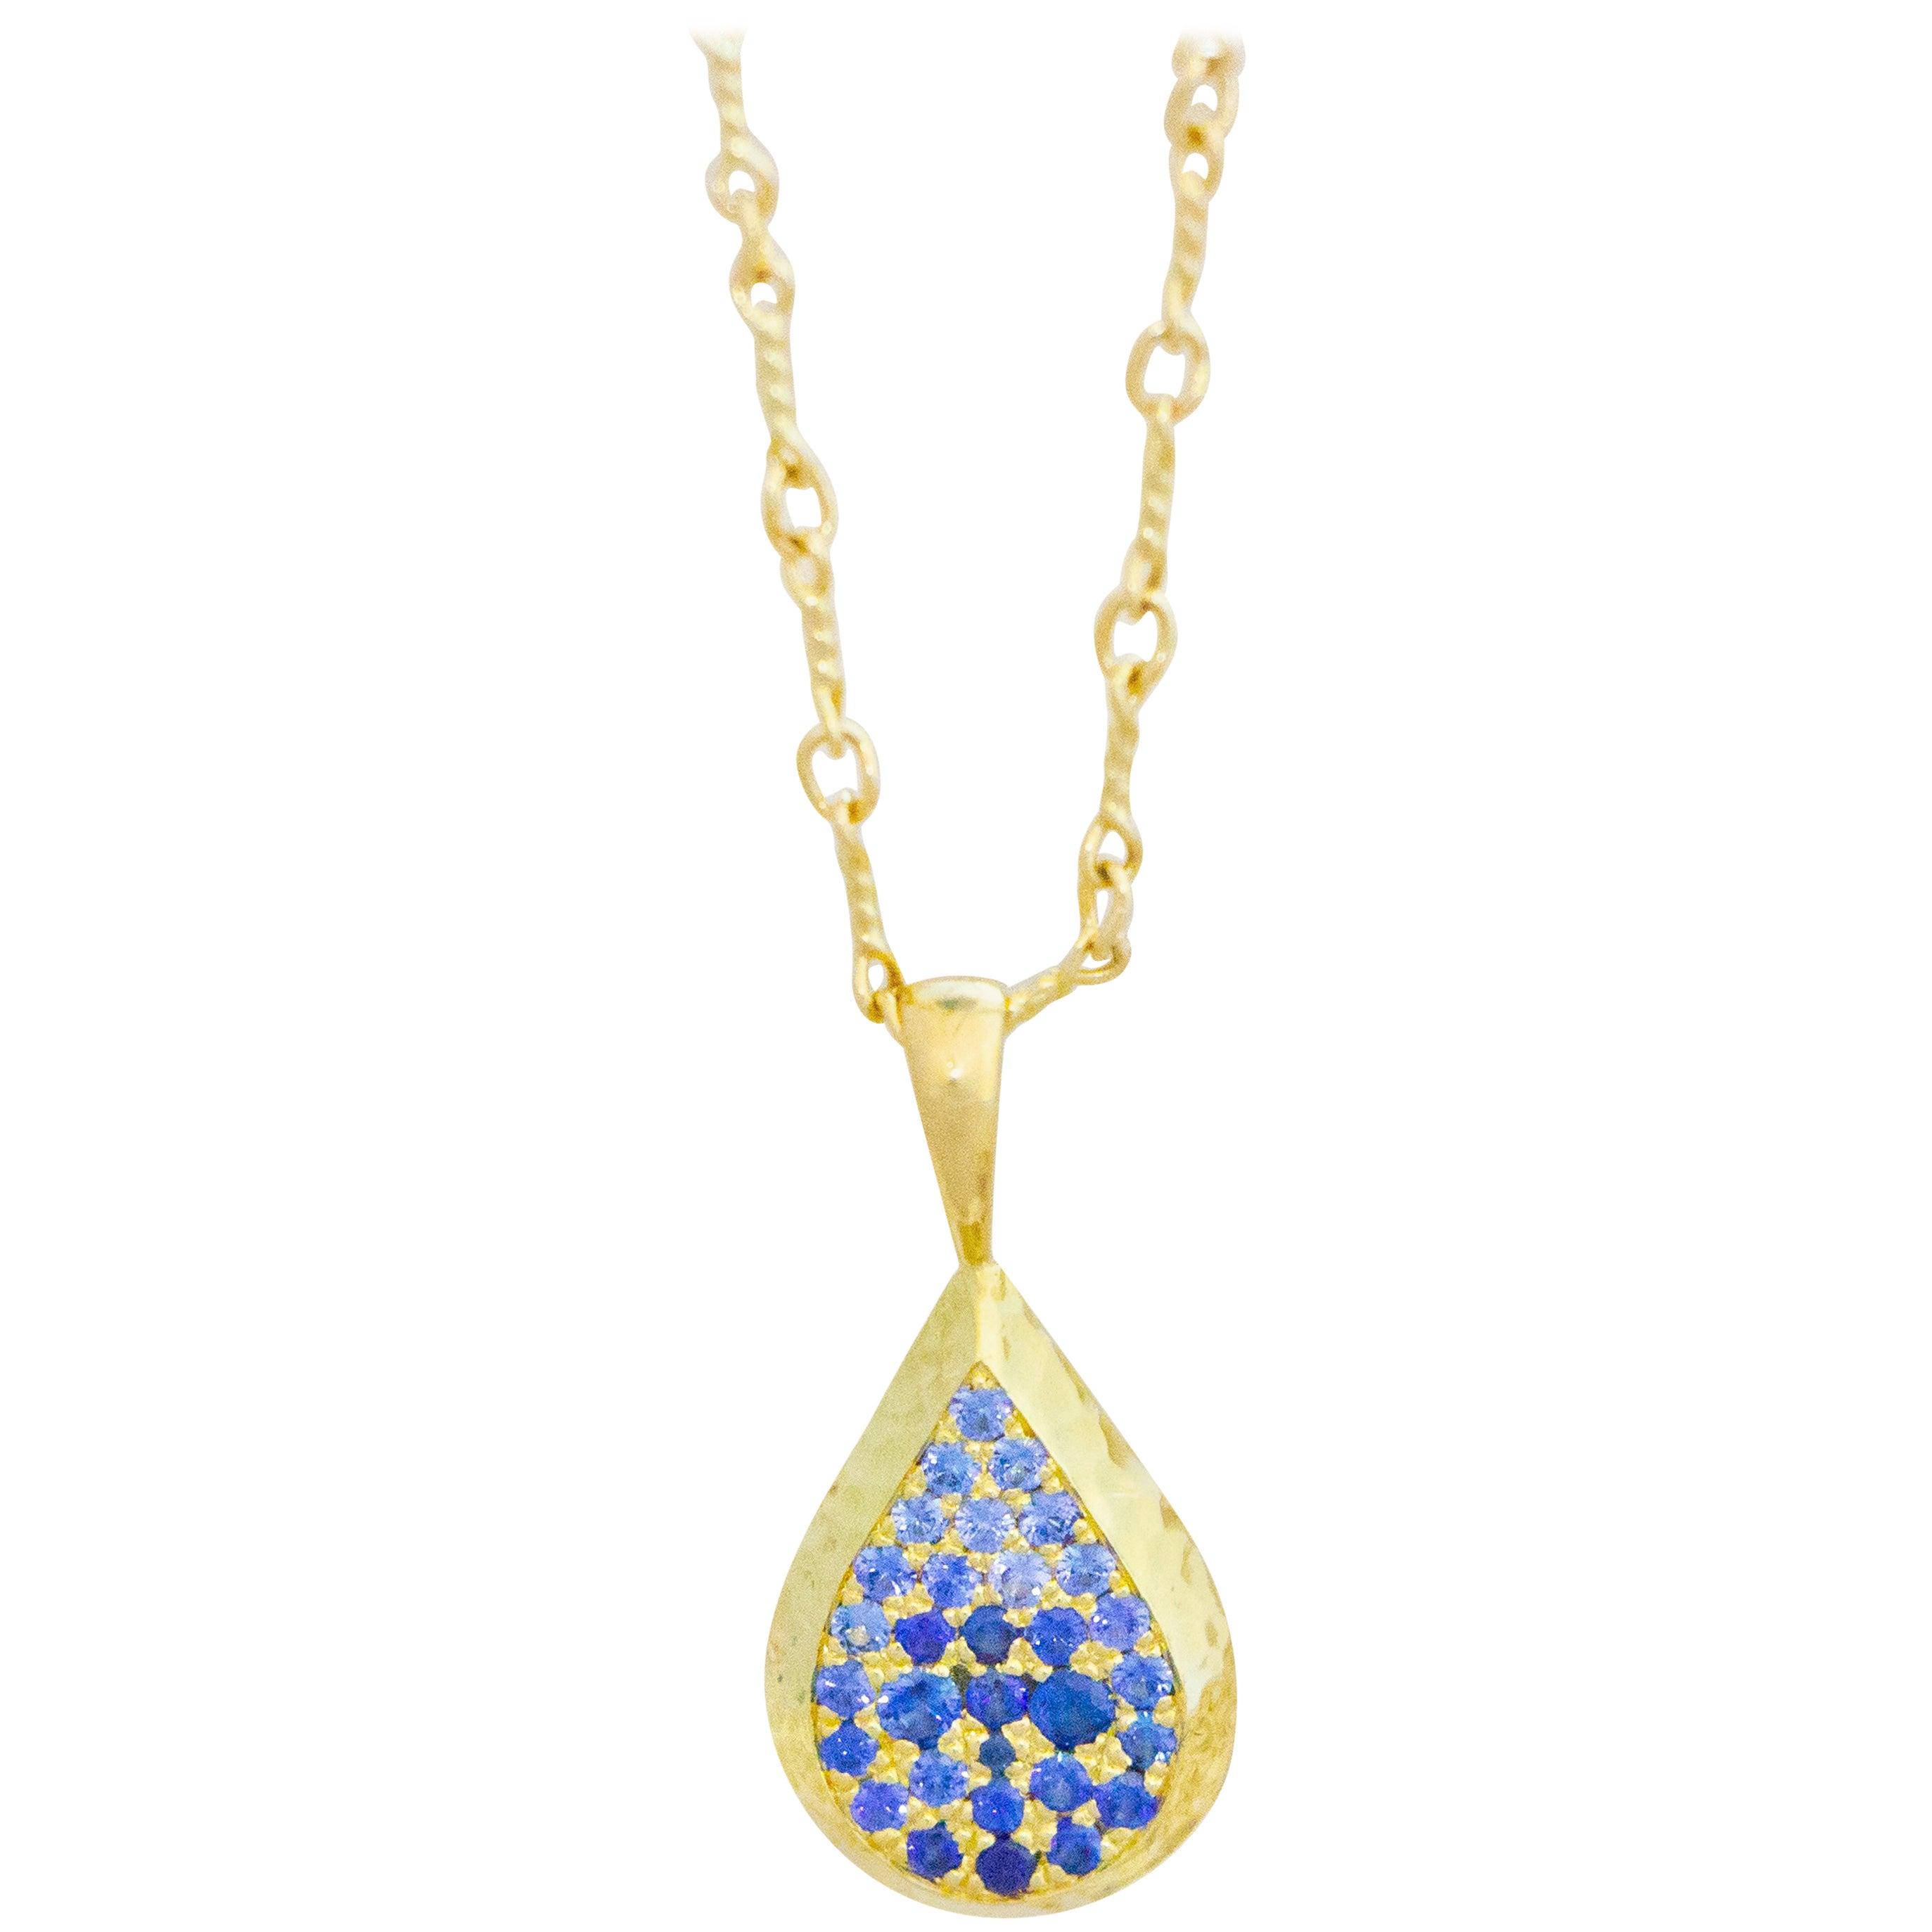 Ceylon Sapphire and Canadian Diamond 18 Karat Gold Drop Pendant Necklace